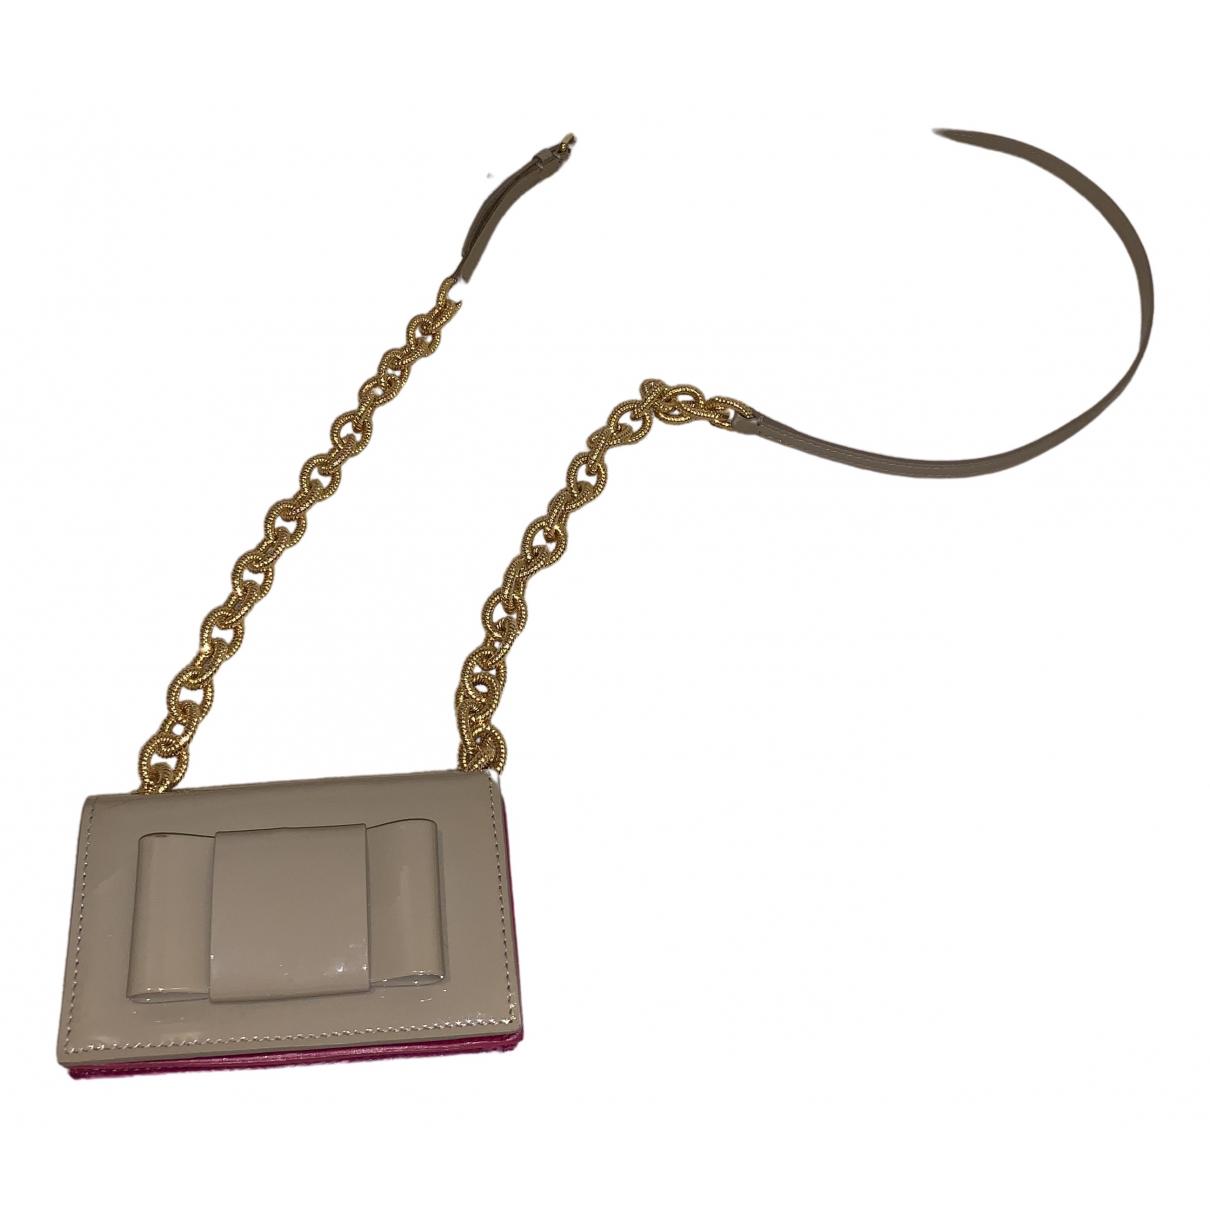 Miu Miu \N Handtasche in  Beige Lackleder